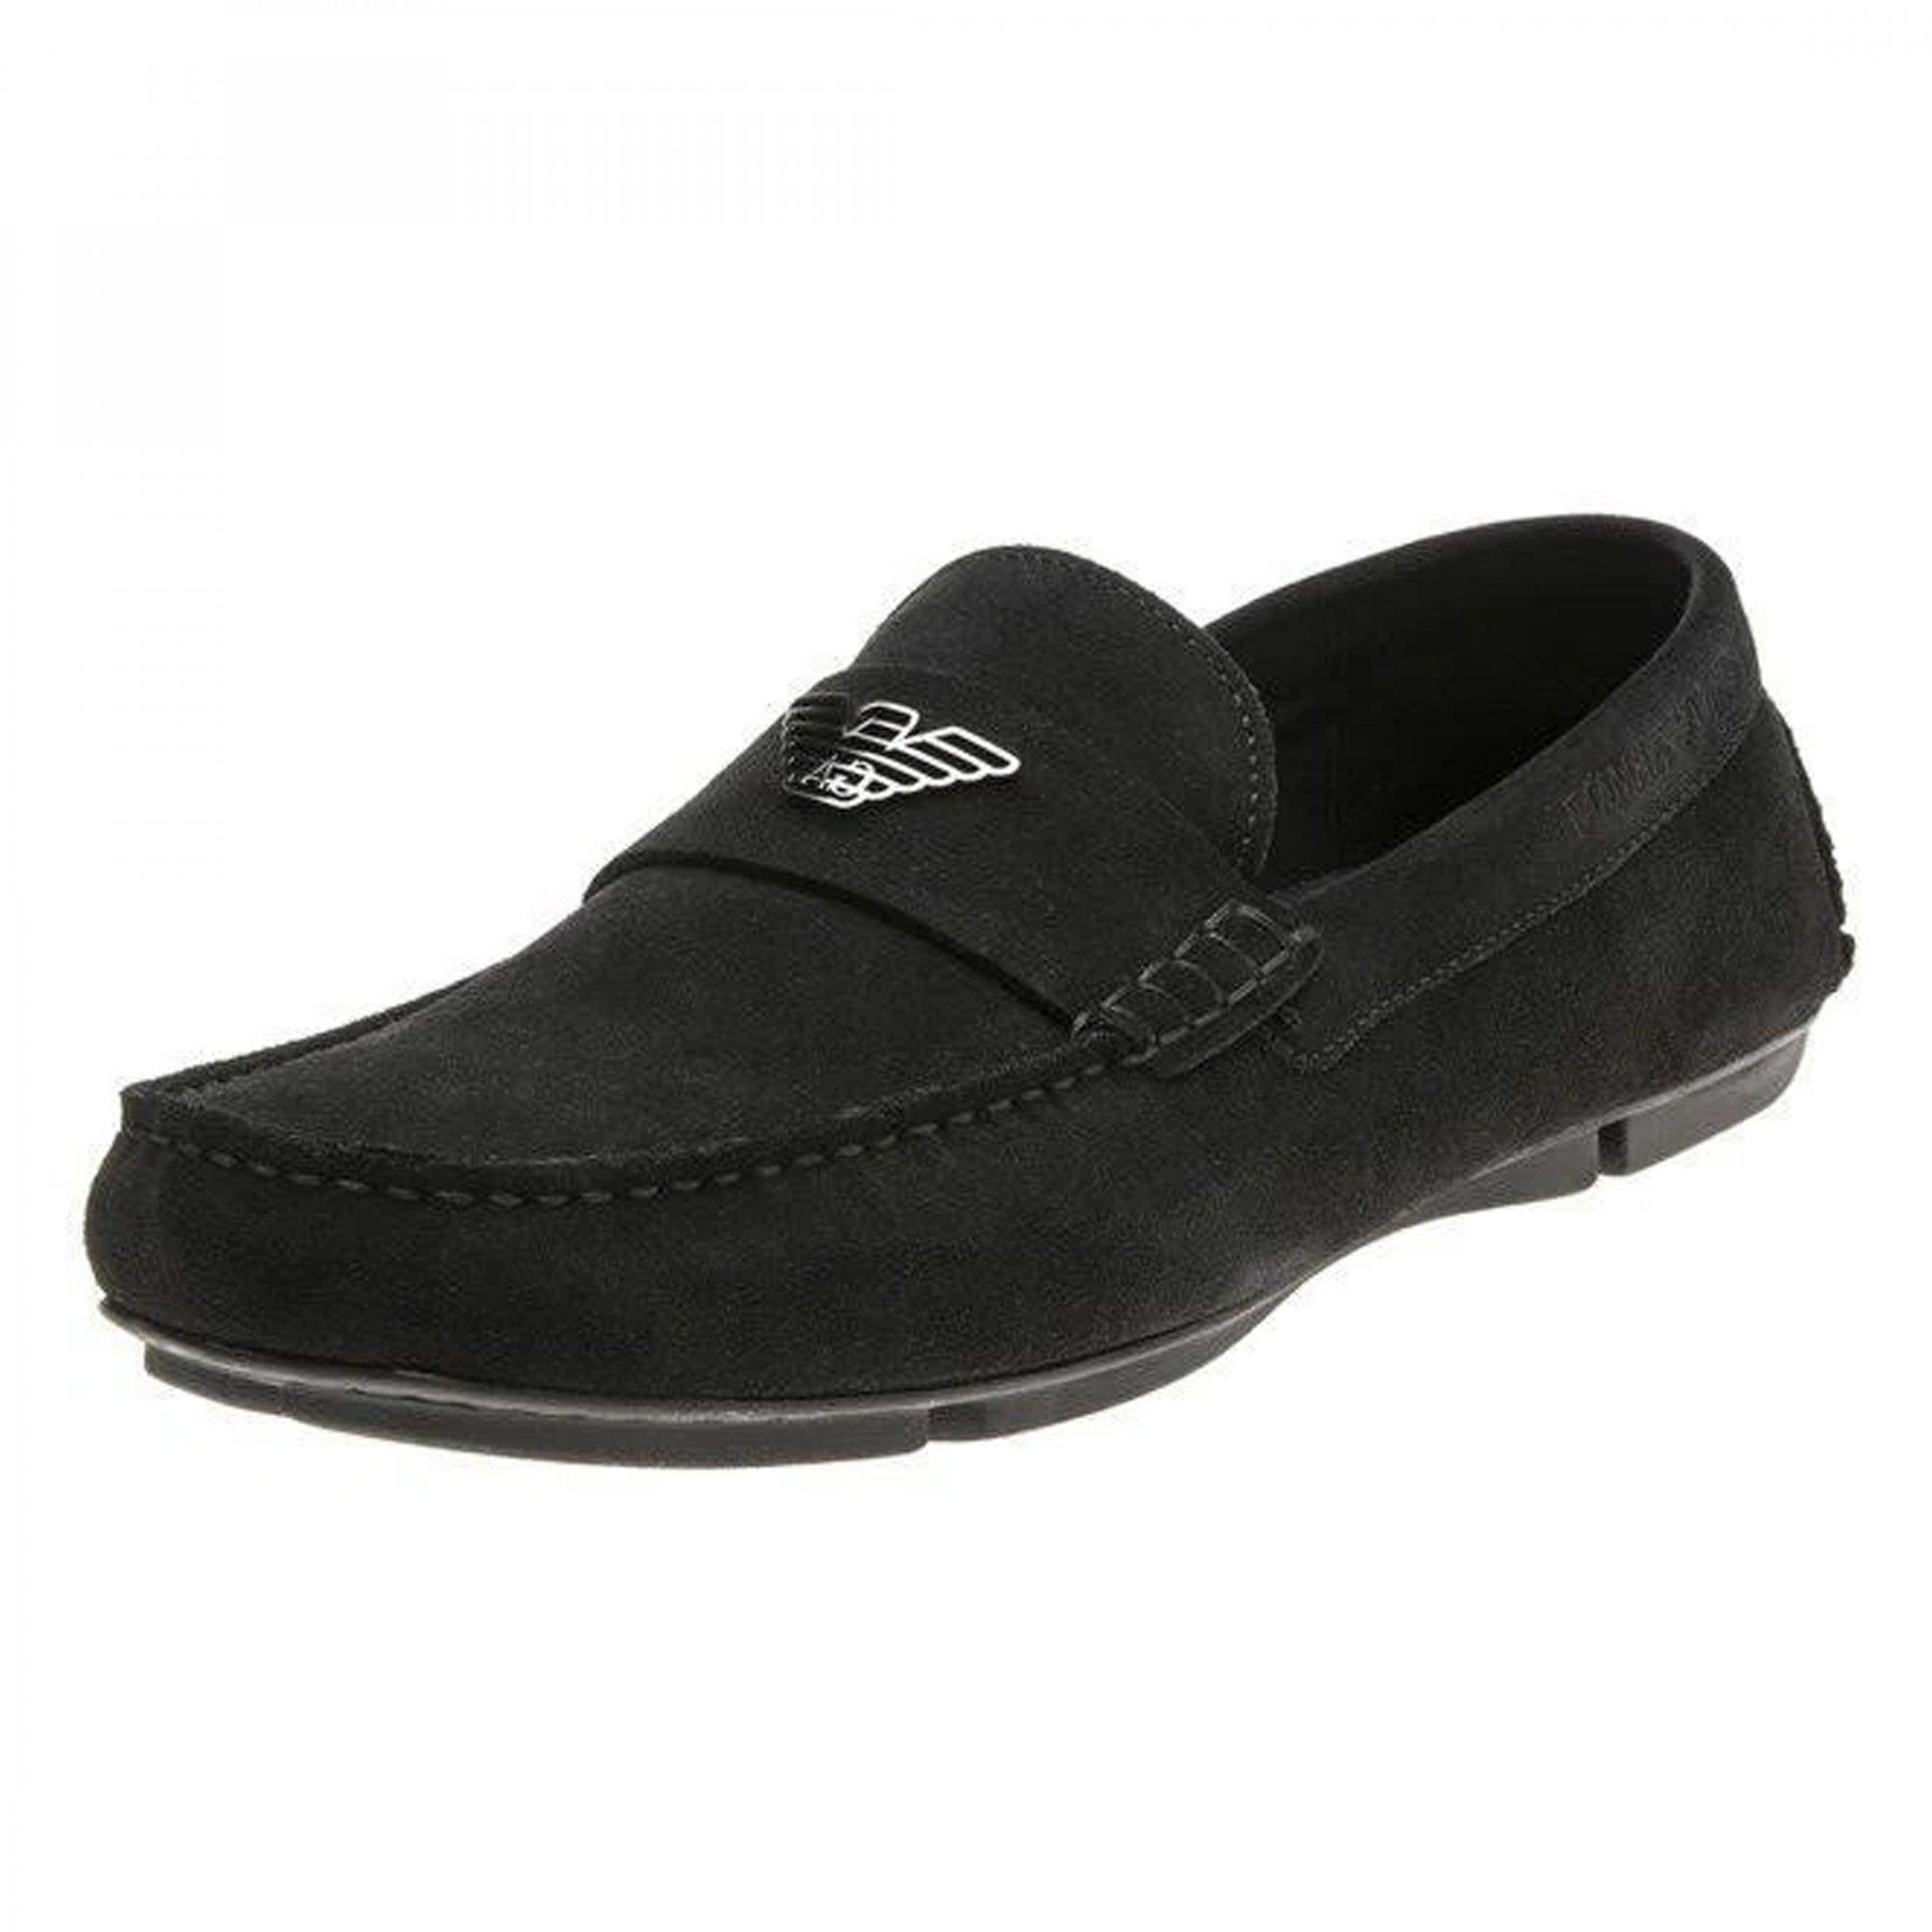 armani slip on shoes